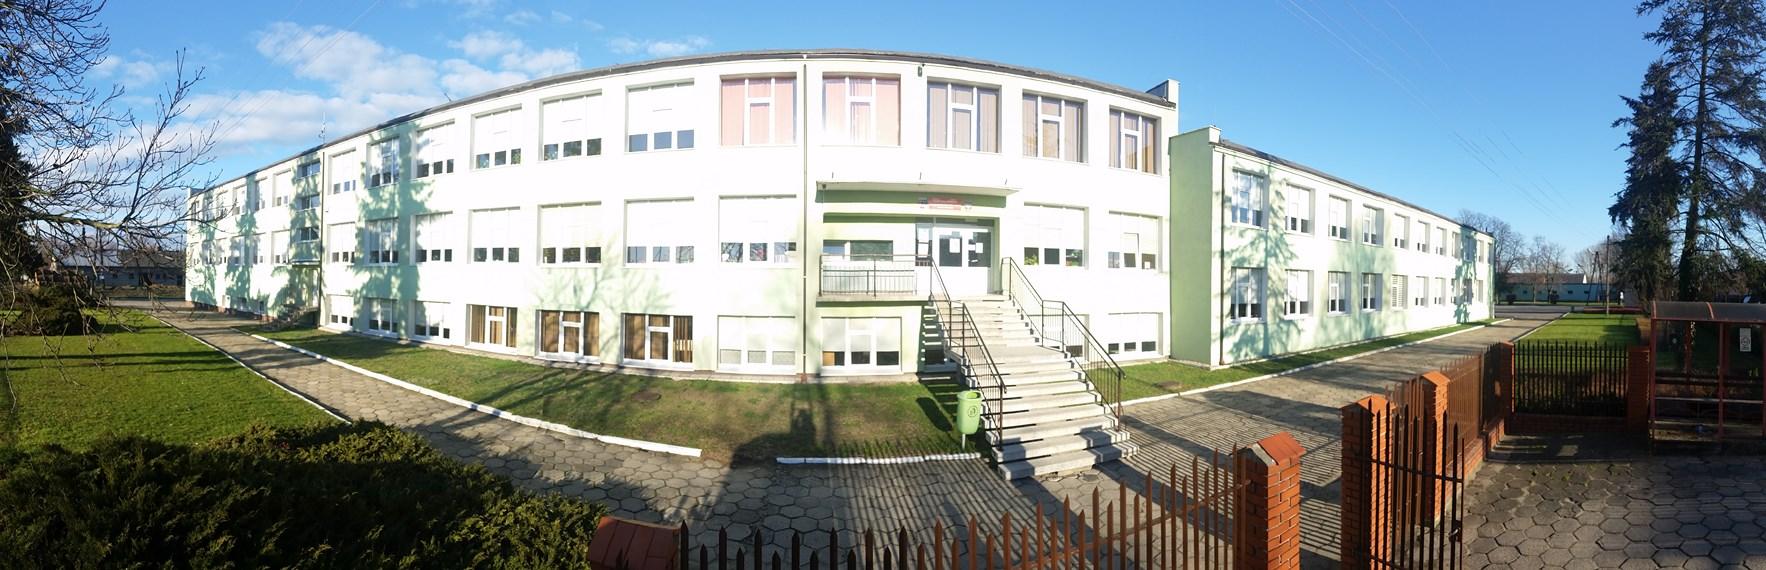 baner_budynek1